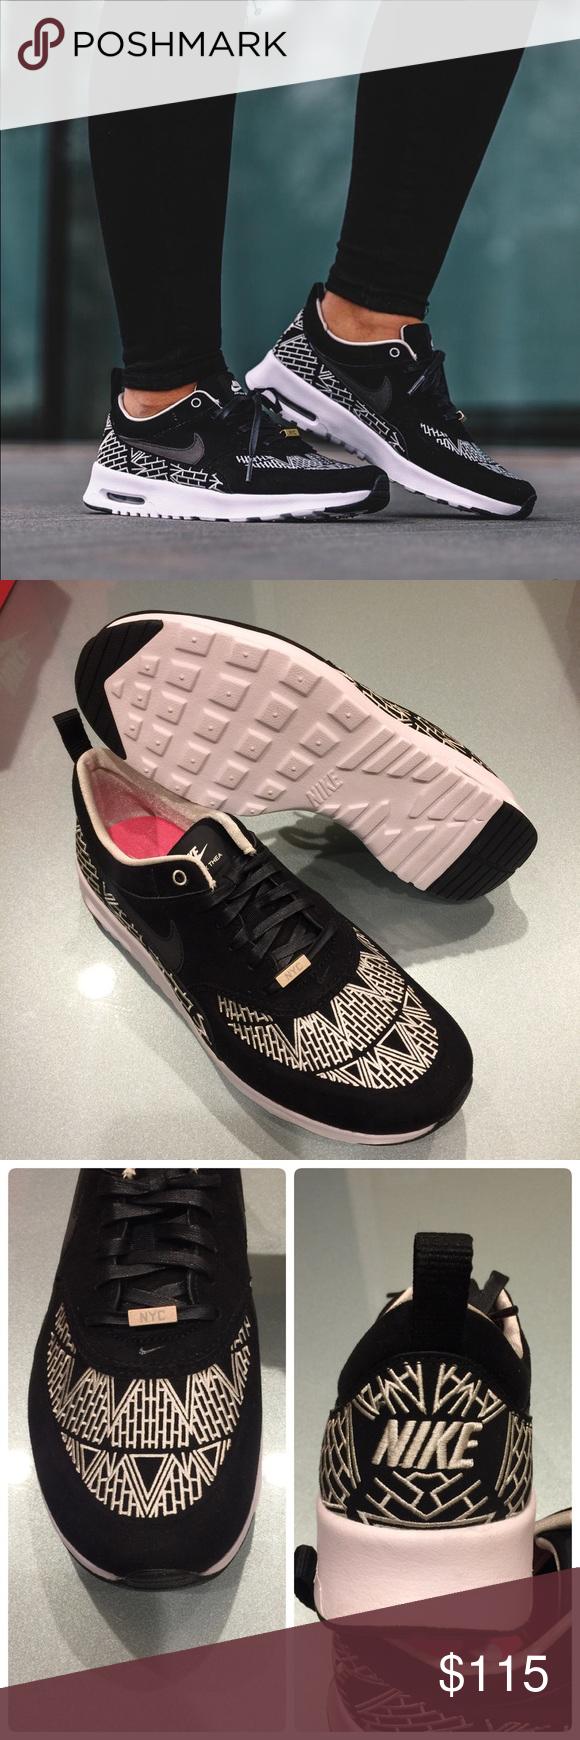 Nike Air Max Thea LOTC